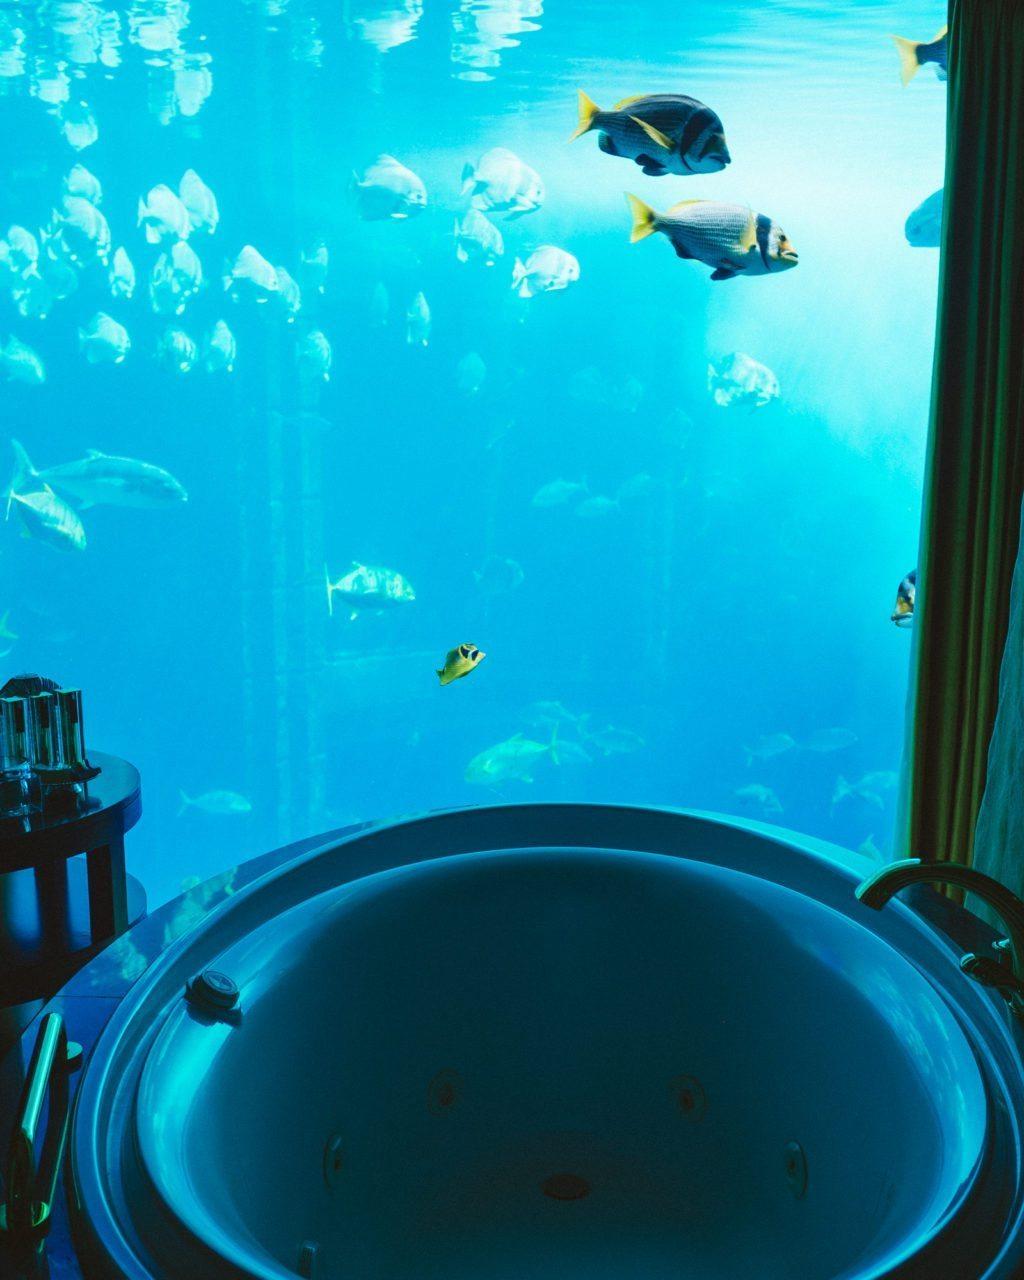 atlantis-the-palm-dubai-neptune-underwater-suite-8934